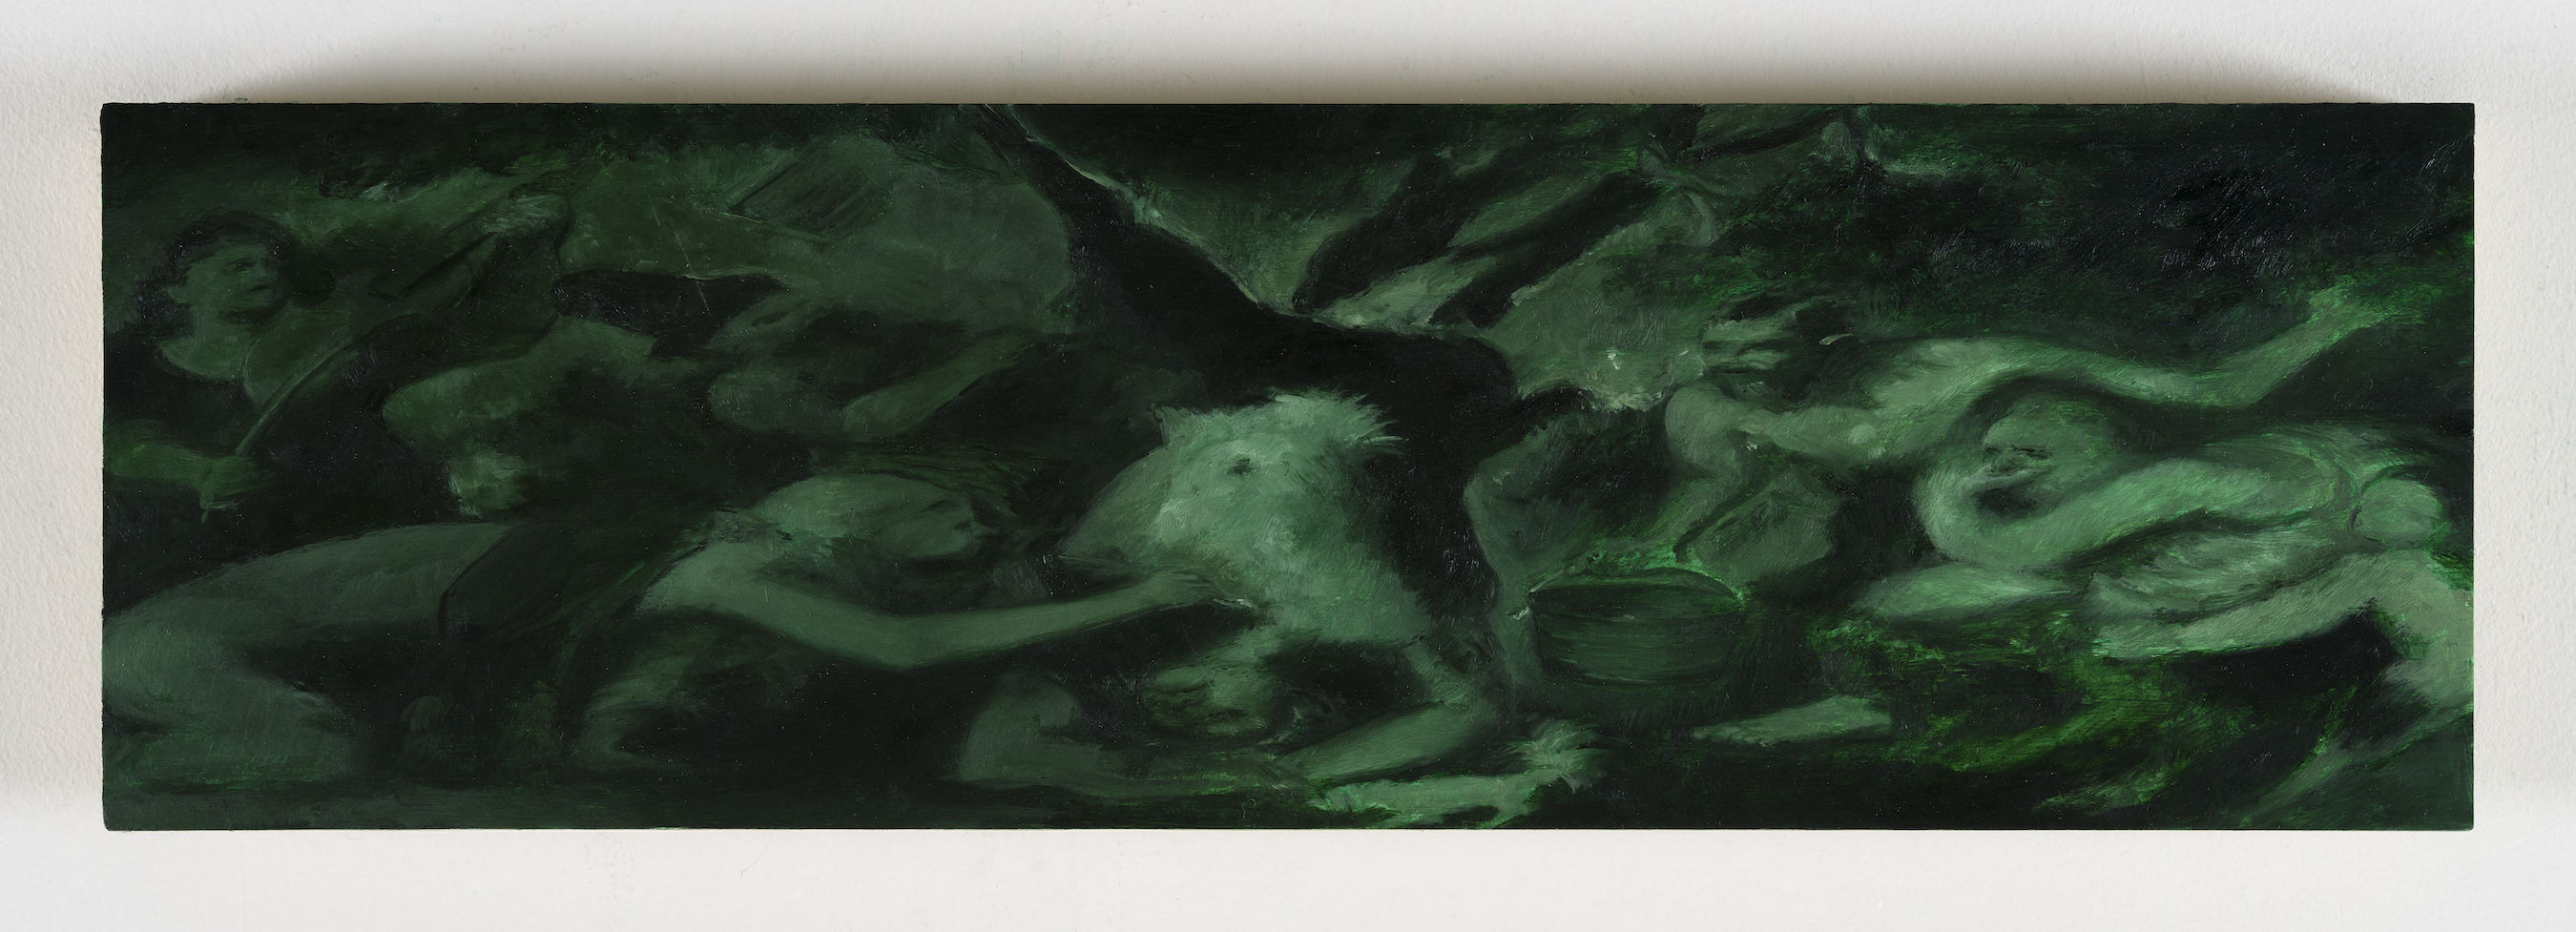 Brook Hsu 'Study of Titian ́s Flaying of Marsyas', 2021, oil on wood, 14 x 46.3 x 2 cm. Photo: Stephen Faught, Courtesy the artist; Kraupa - Tuskany Zeidler, Berlin